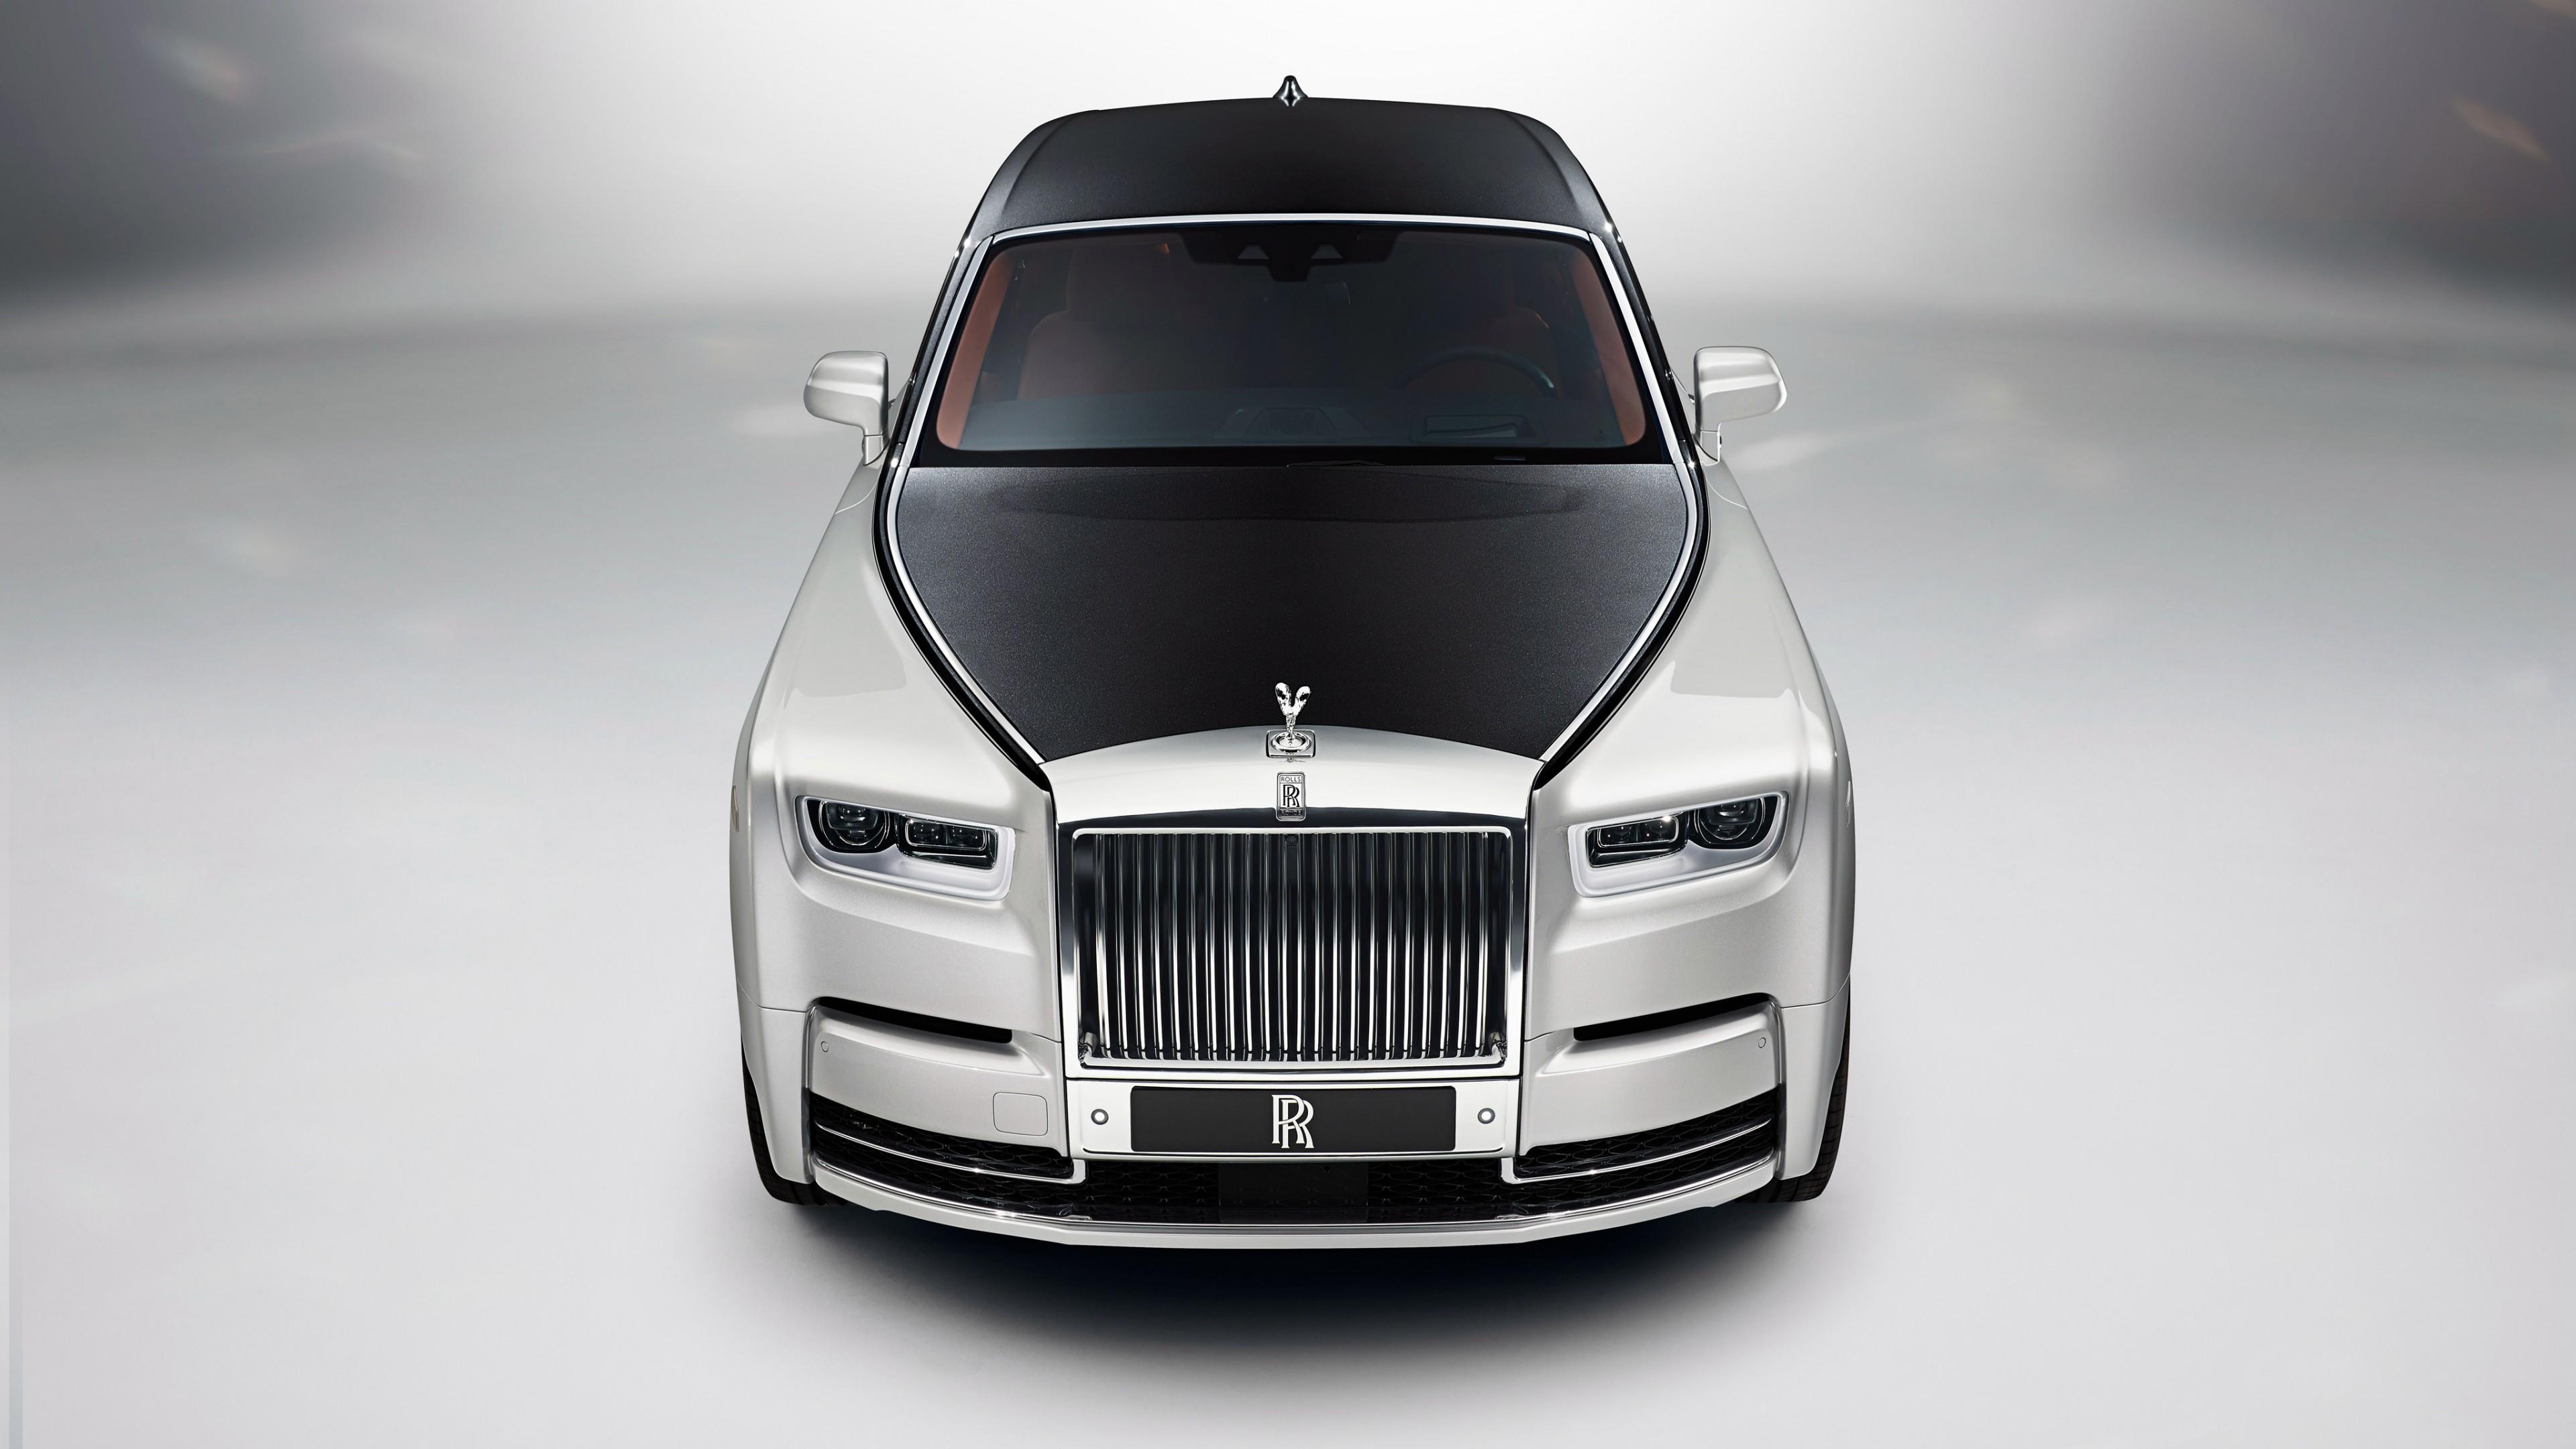 2017 rolls royce phantom 3 wallpaper hd car wallpapers - Royal royce car wallpaper ...